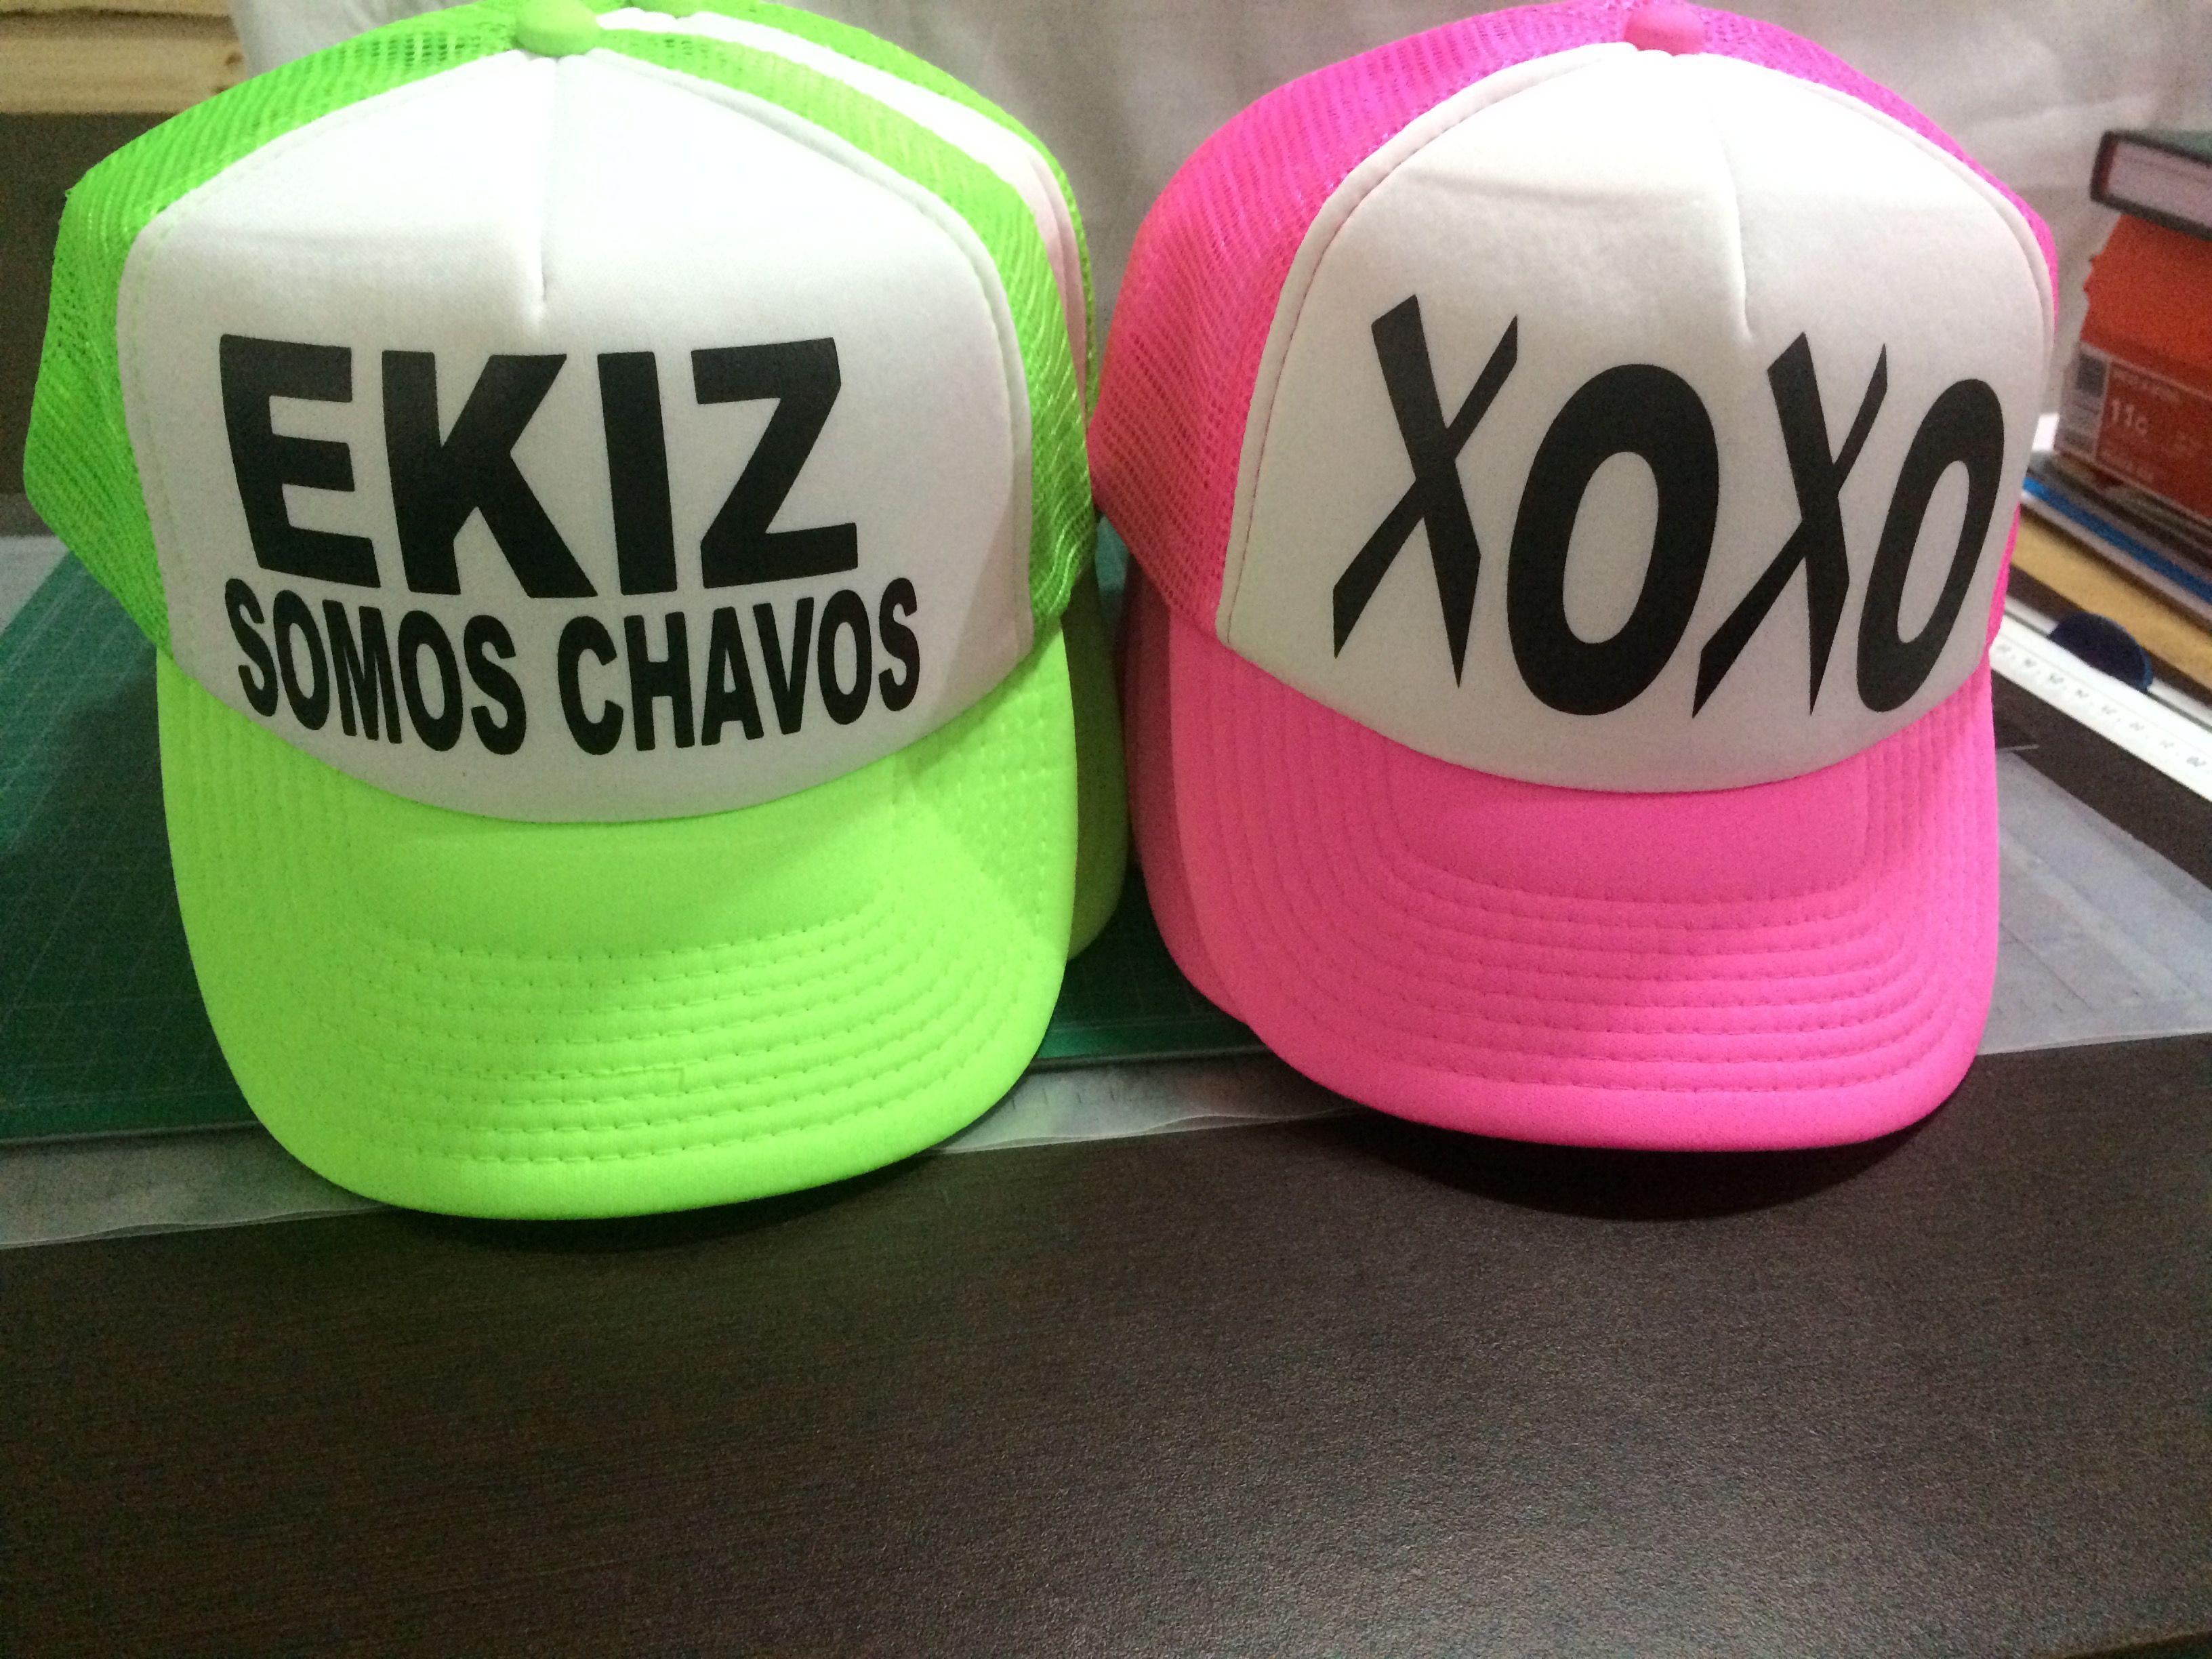 d8511a802fe1c Gorras personalizadas en color neón by Eatbrains! Campeche ...